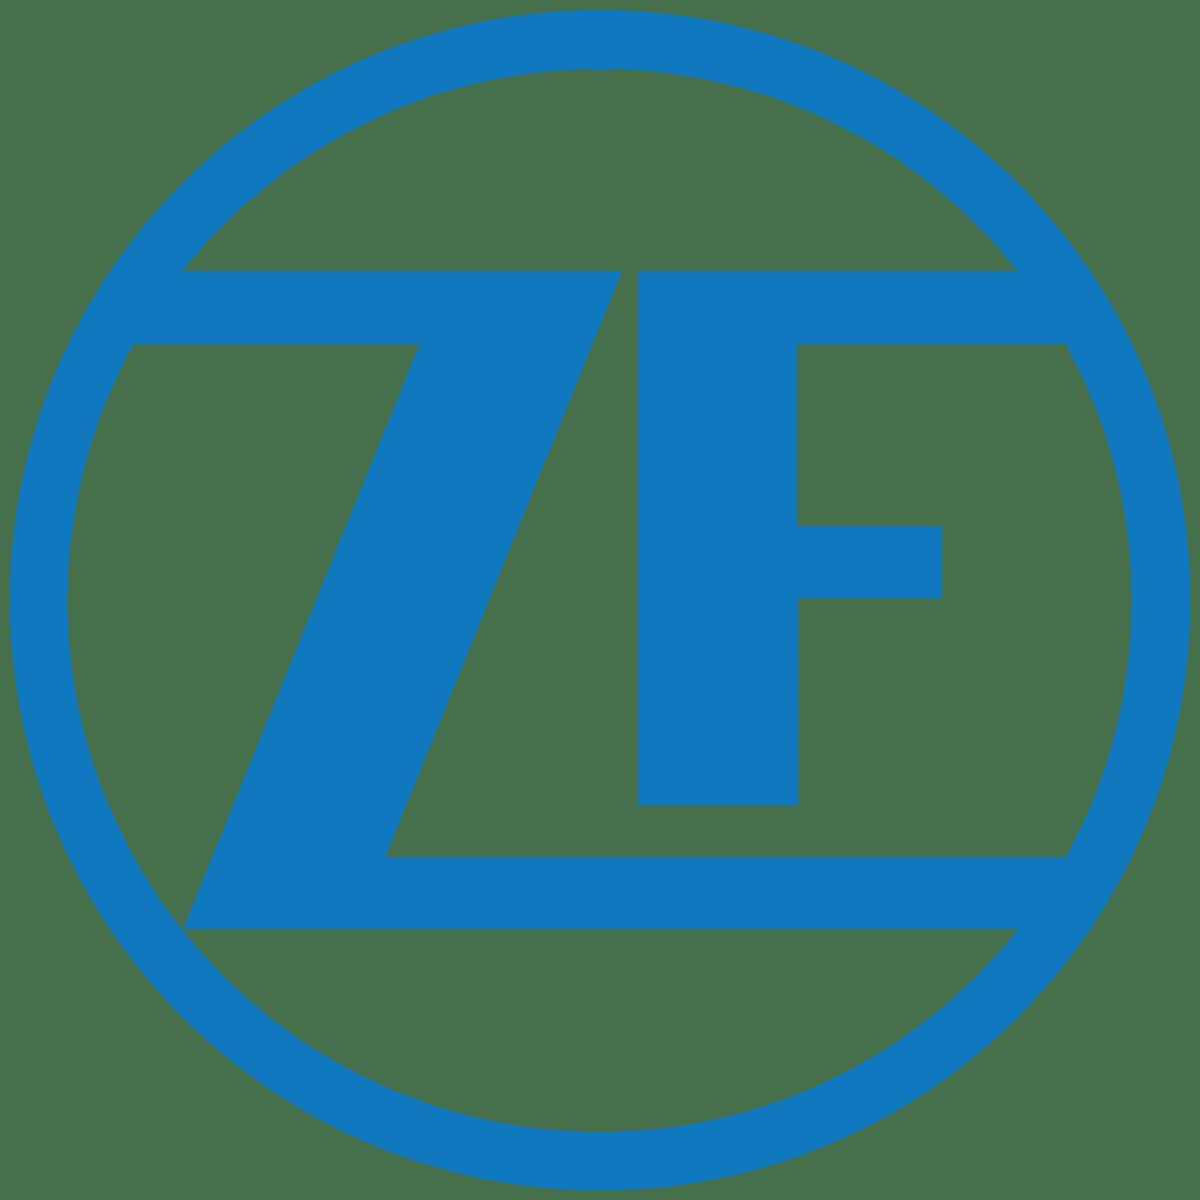 ZF-motor